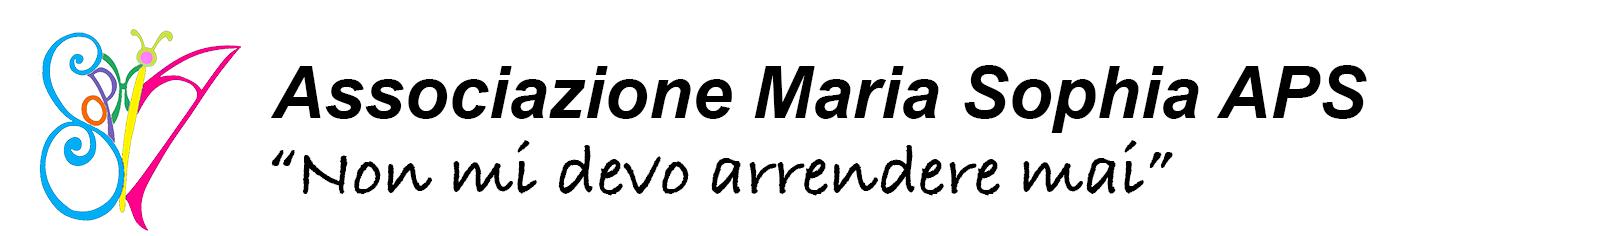 Associazione Maria Sophia APS